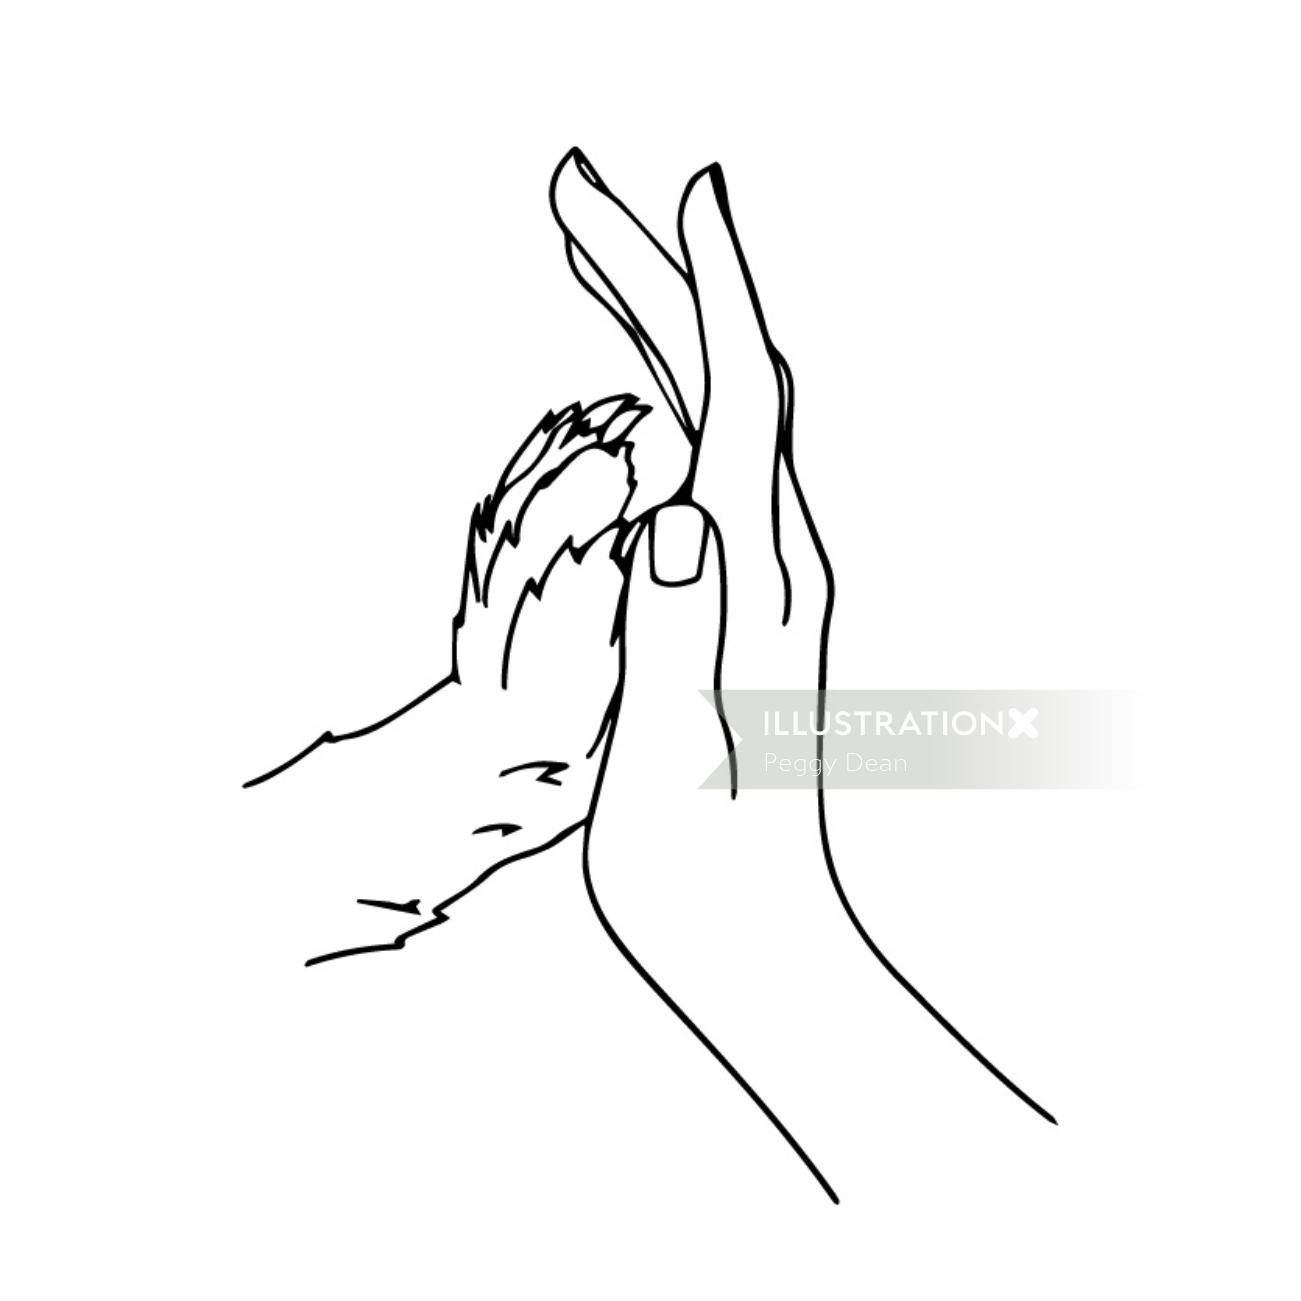 Line artwork of human and animal hands